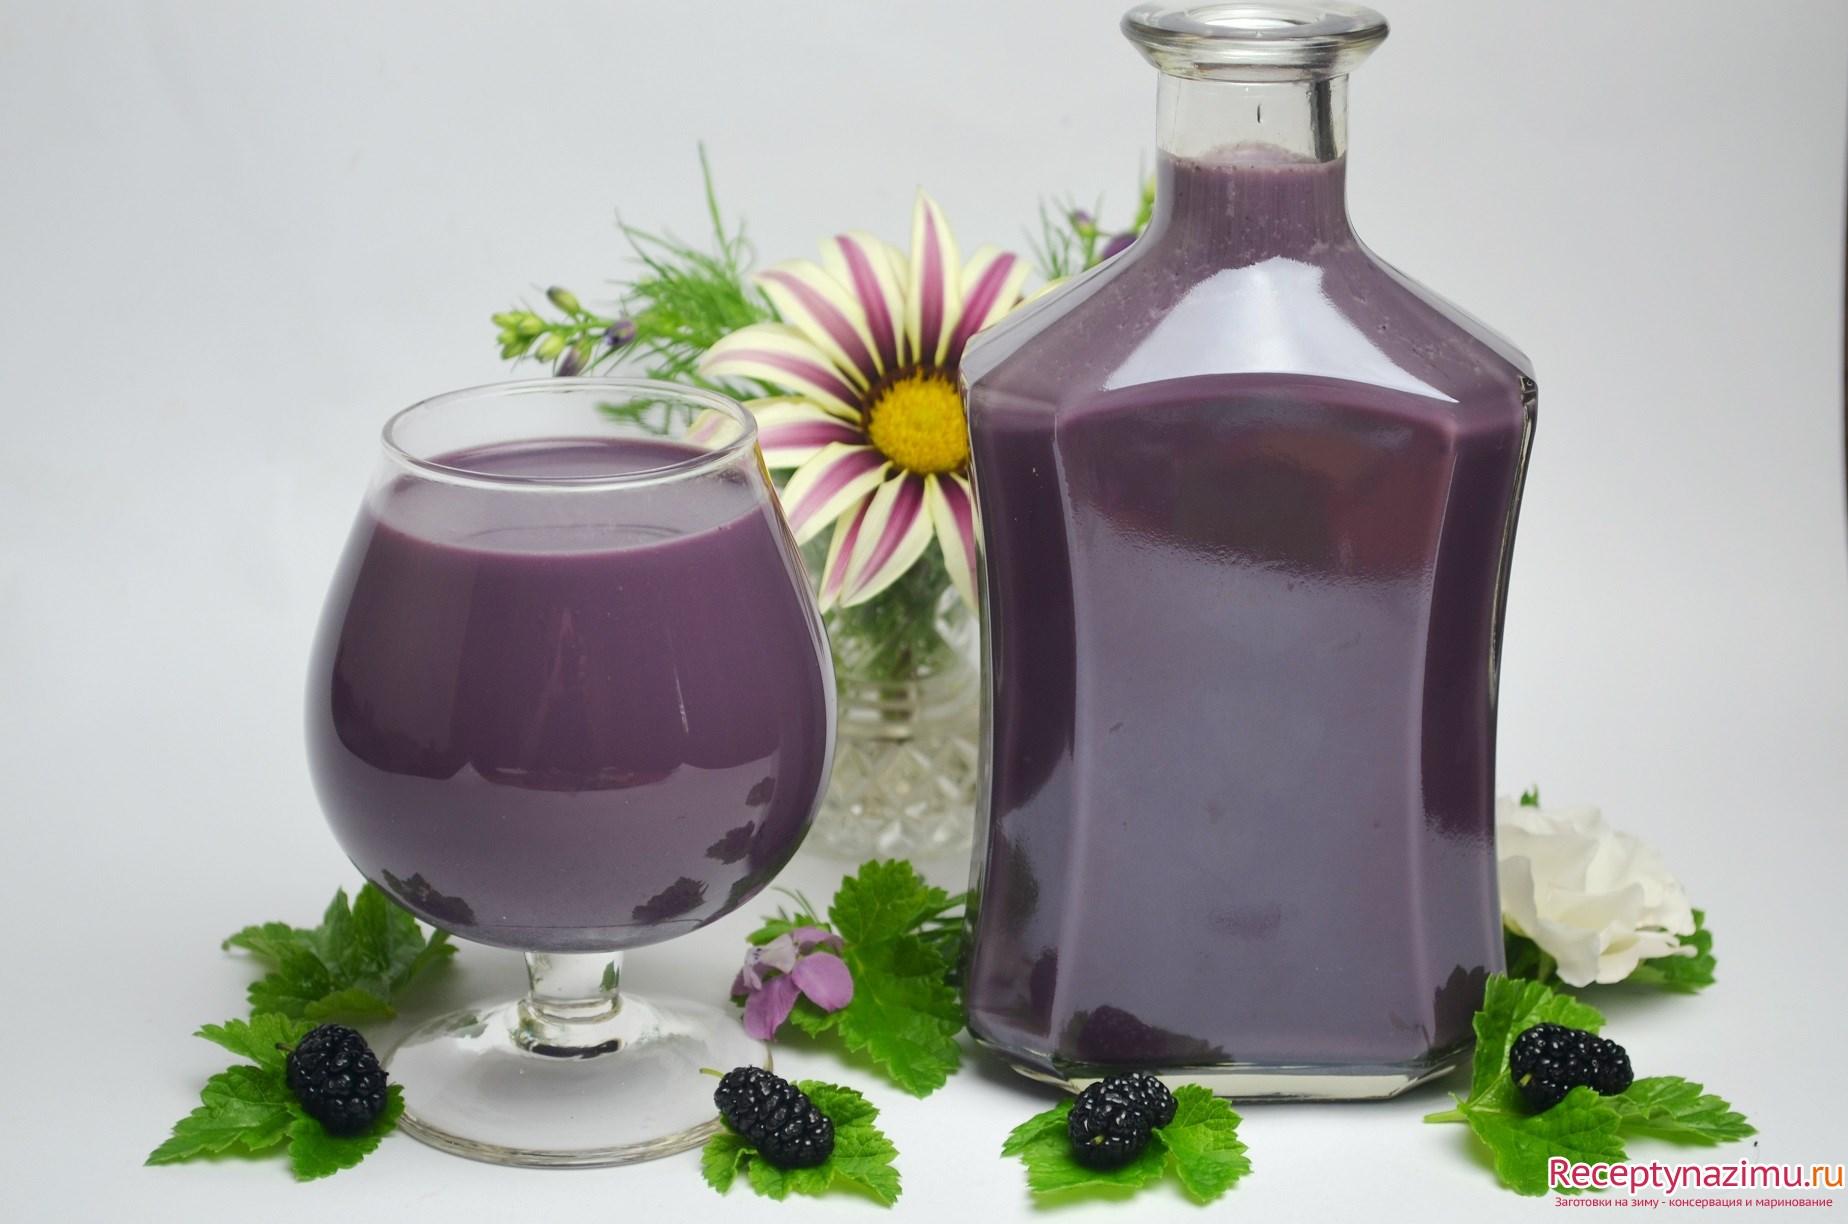 Вишневый ликер в домашних условиях - рецепт 63